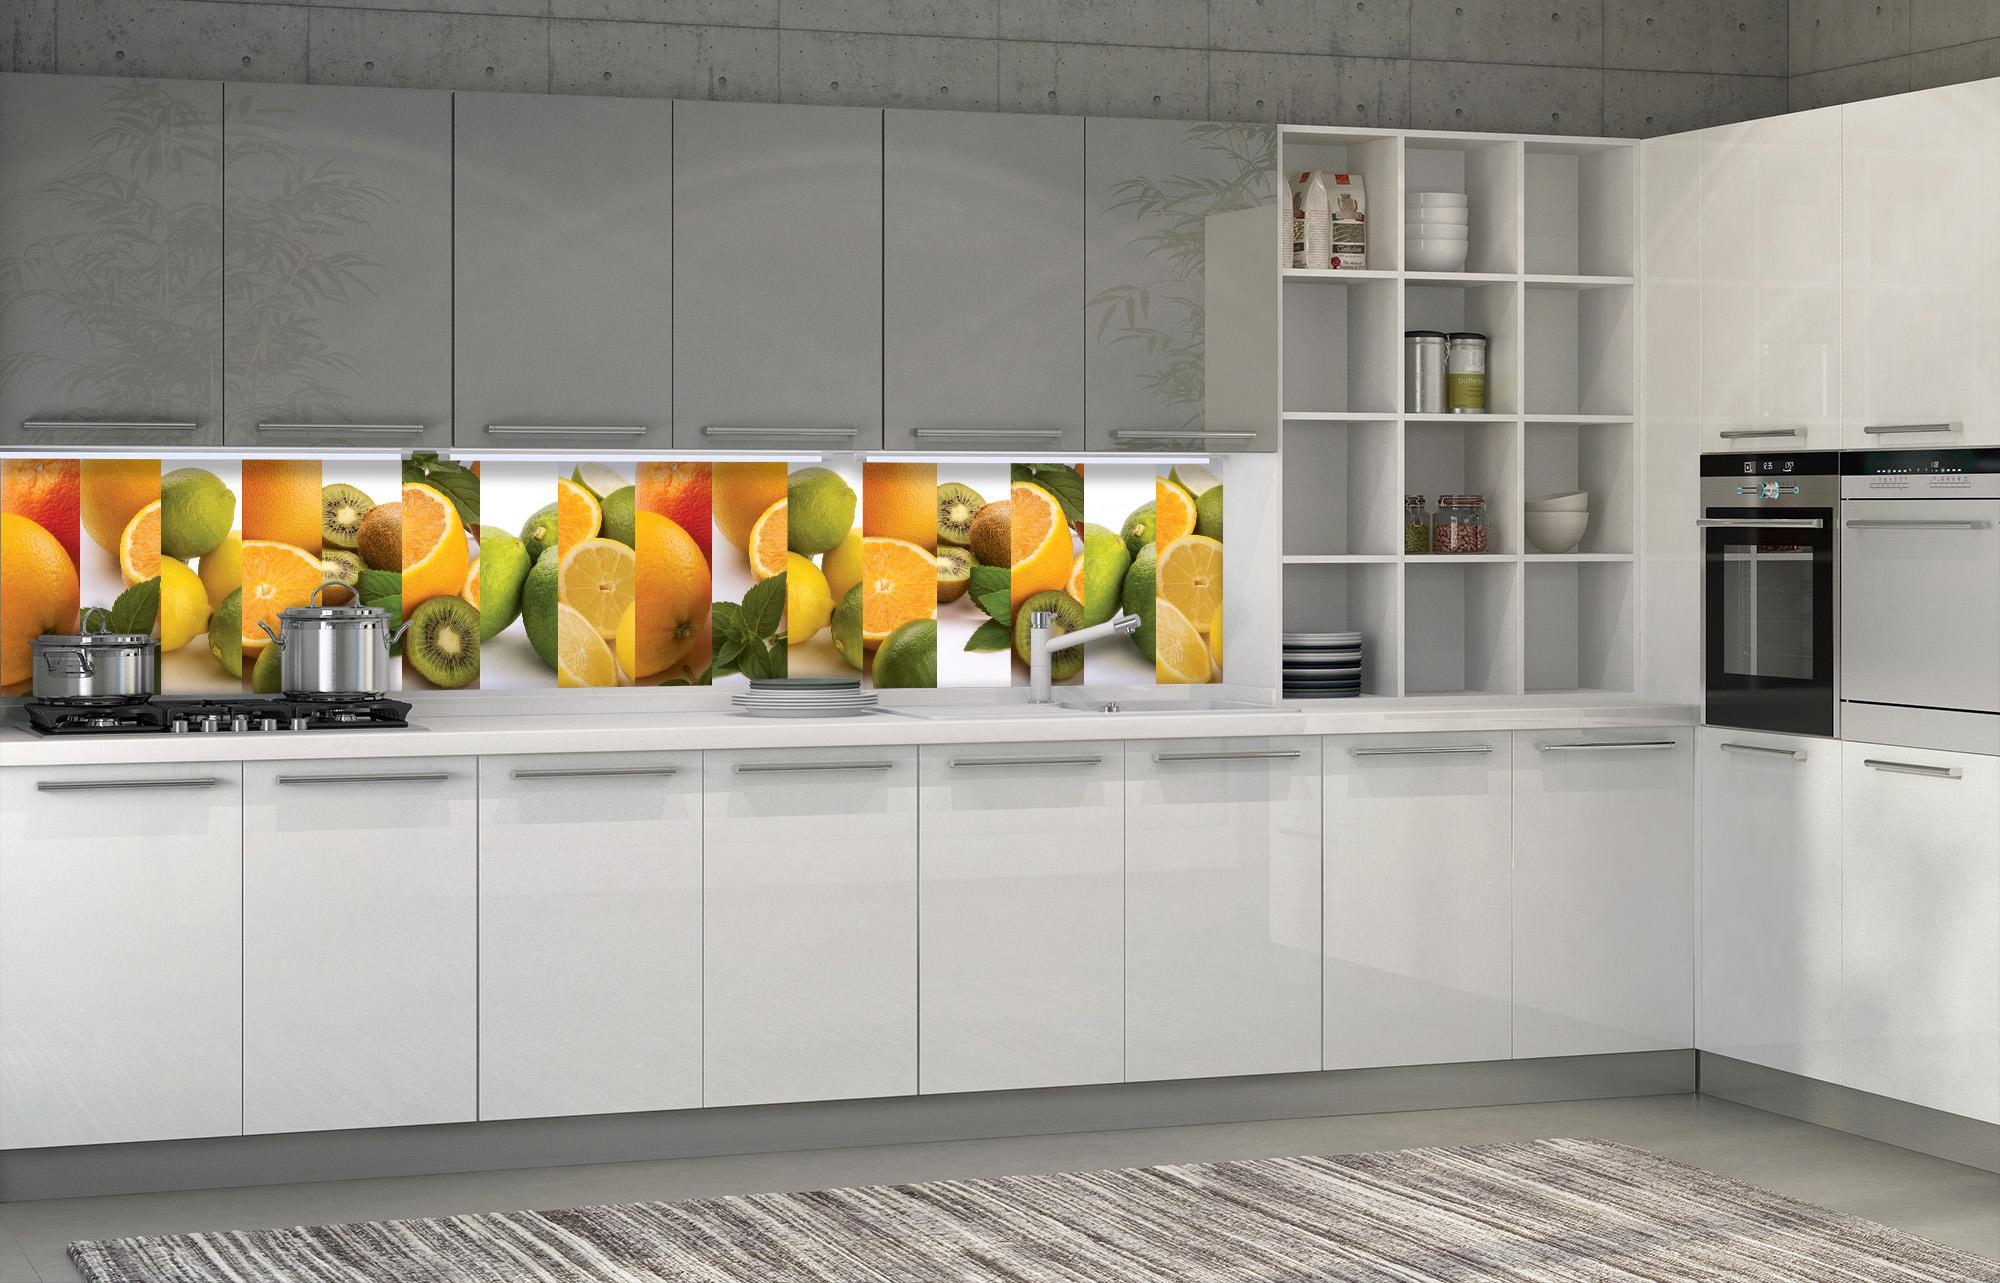 White glossy kitchen in an interior